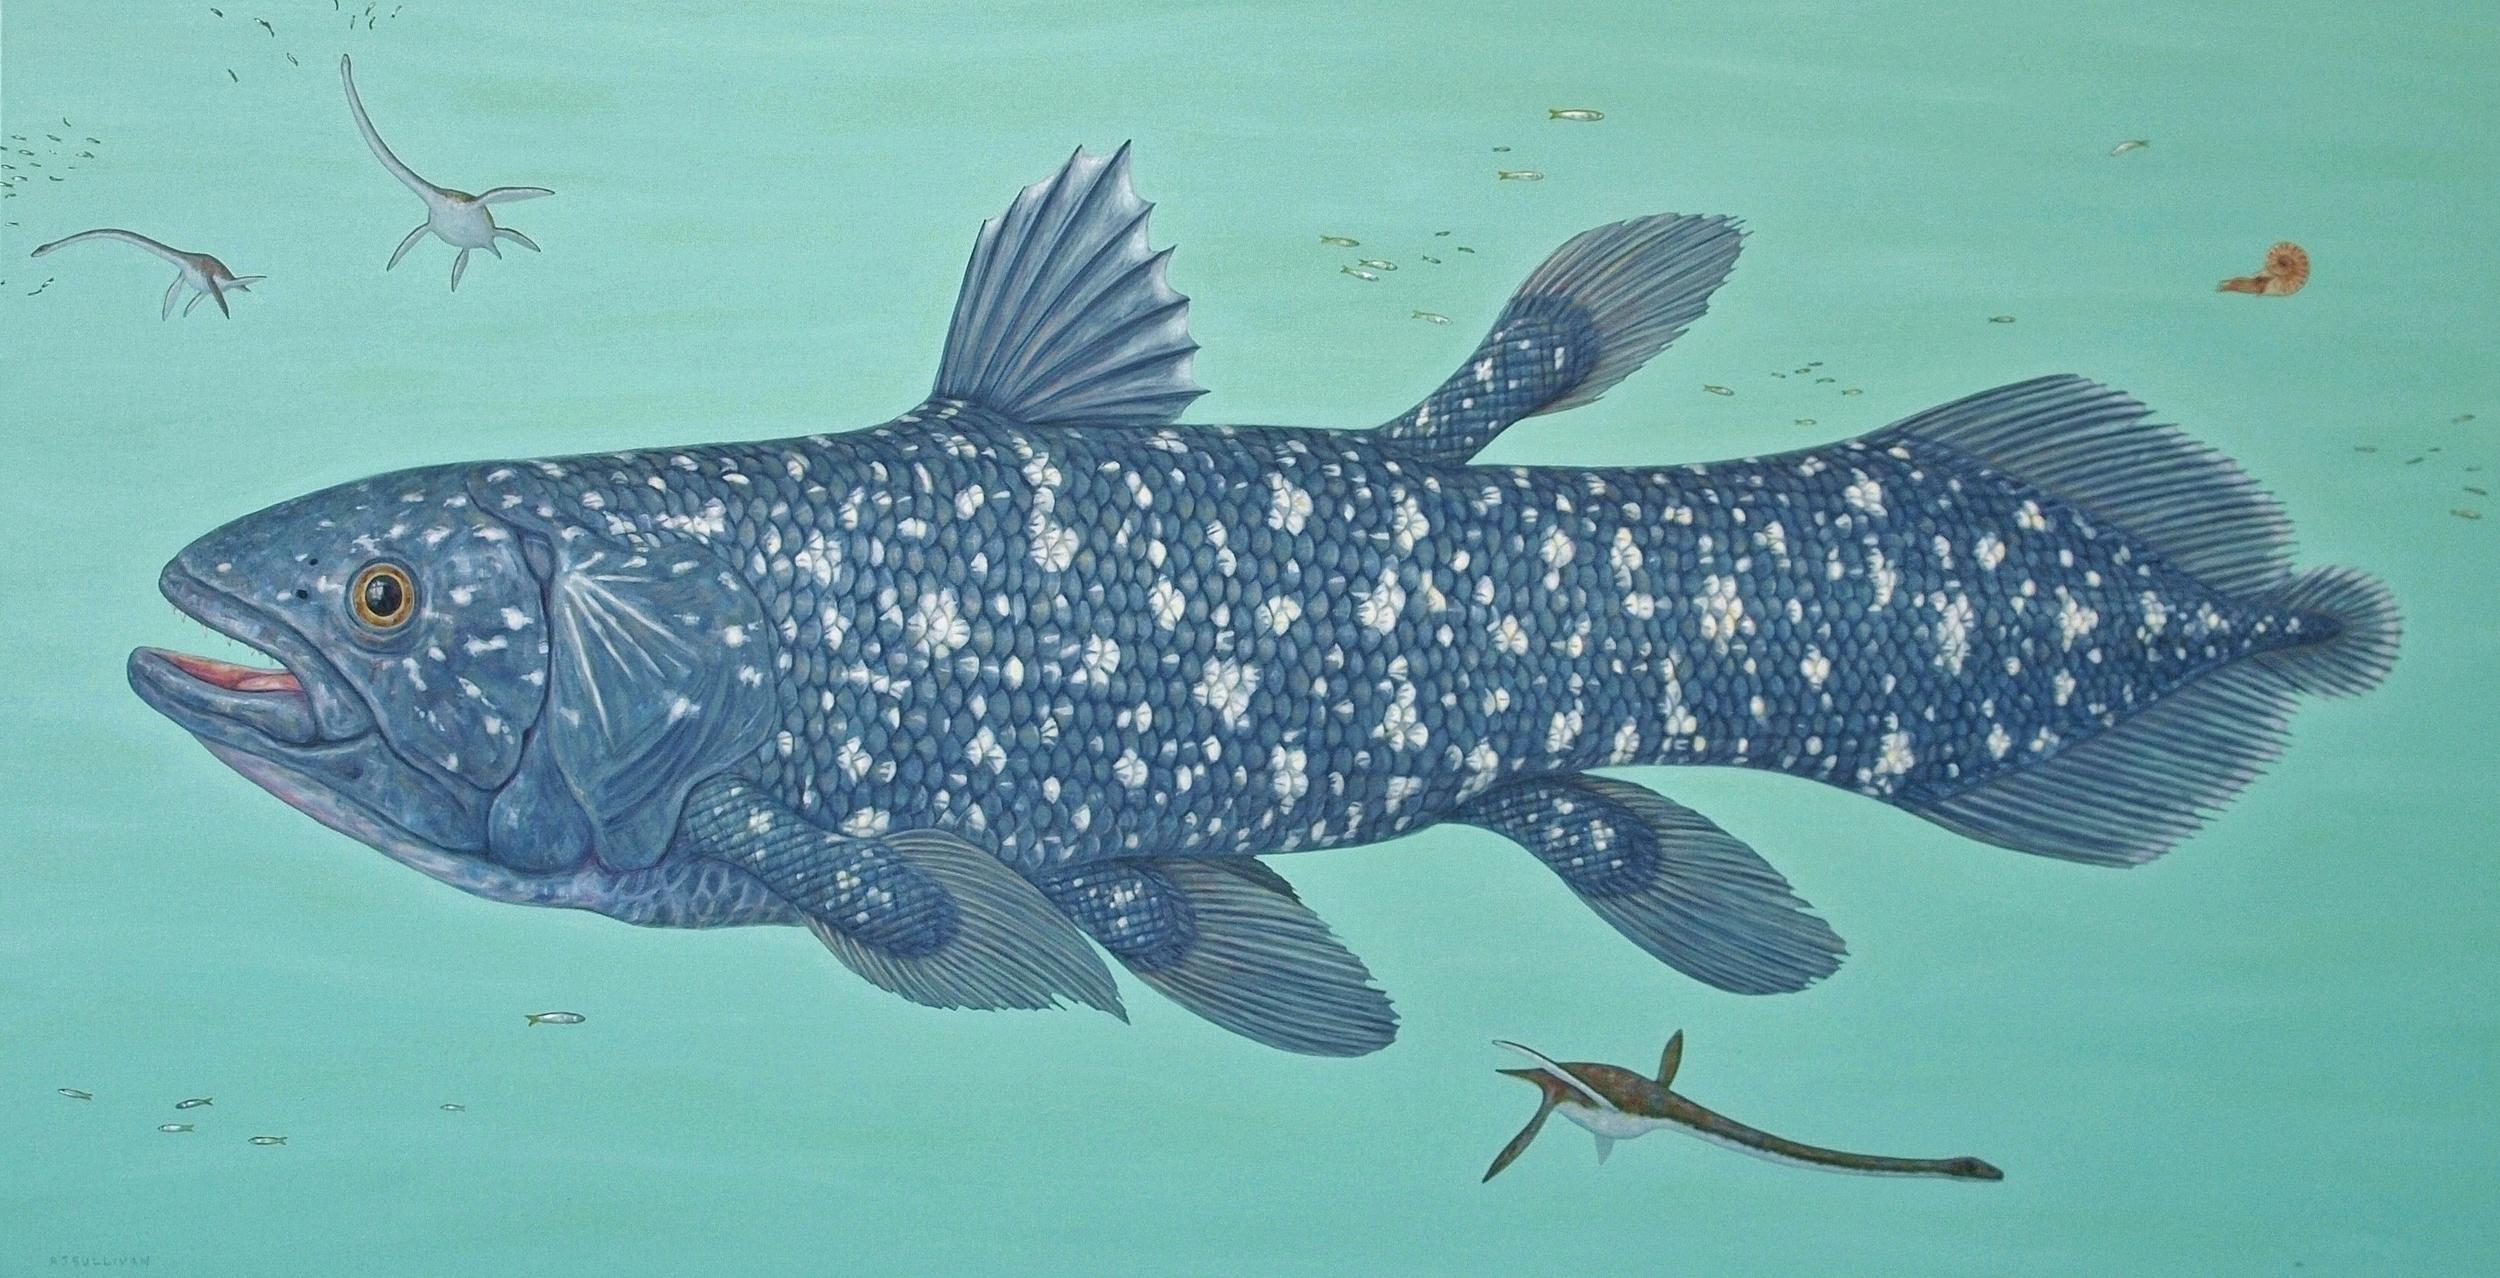 Coelacanth and Elasmosaurs